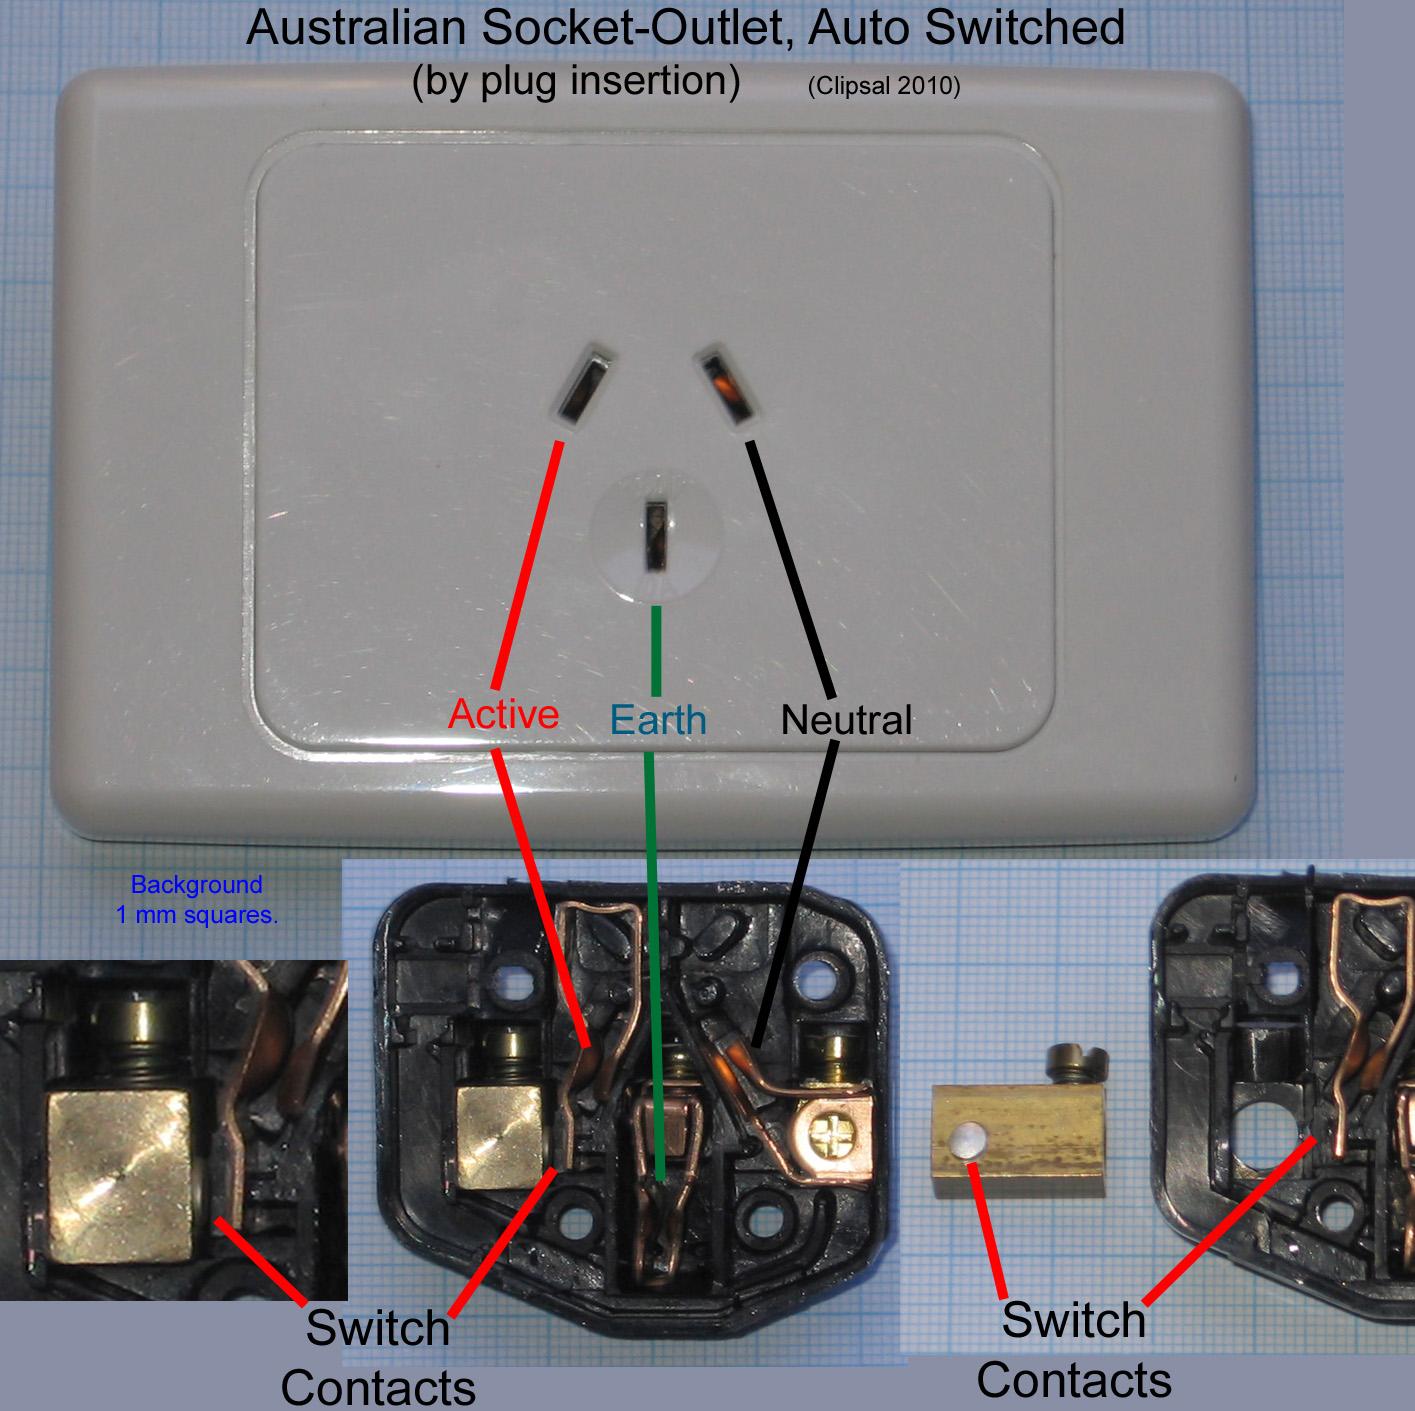 Wiring Diagram For 277v Lighting File Australian Socket Outlet Auto Switched Jpg